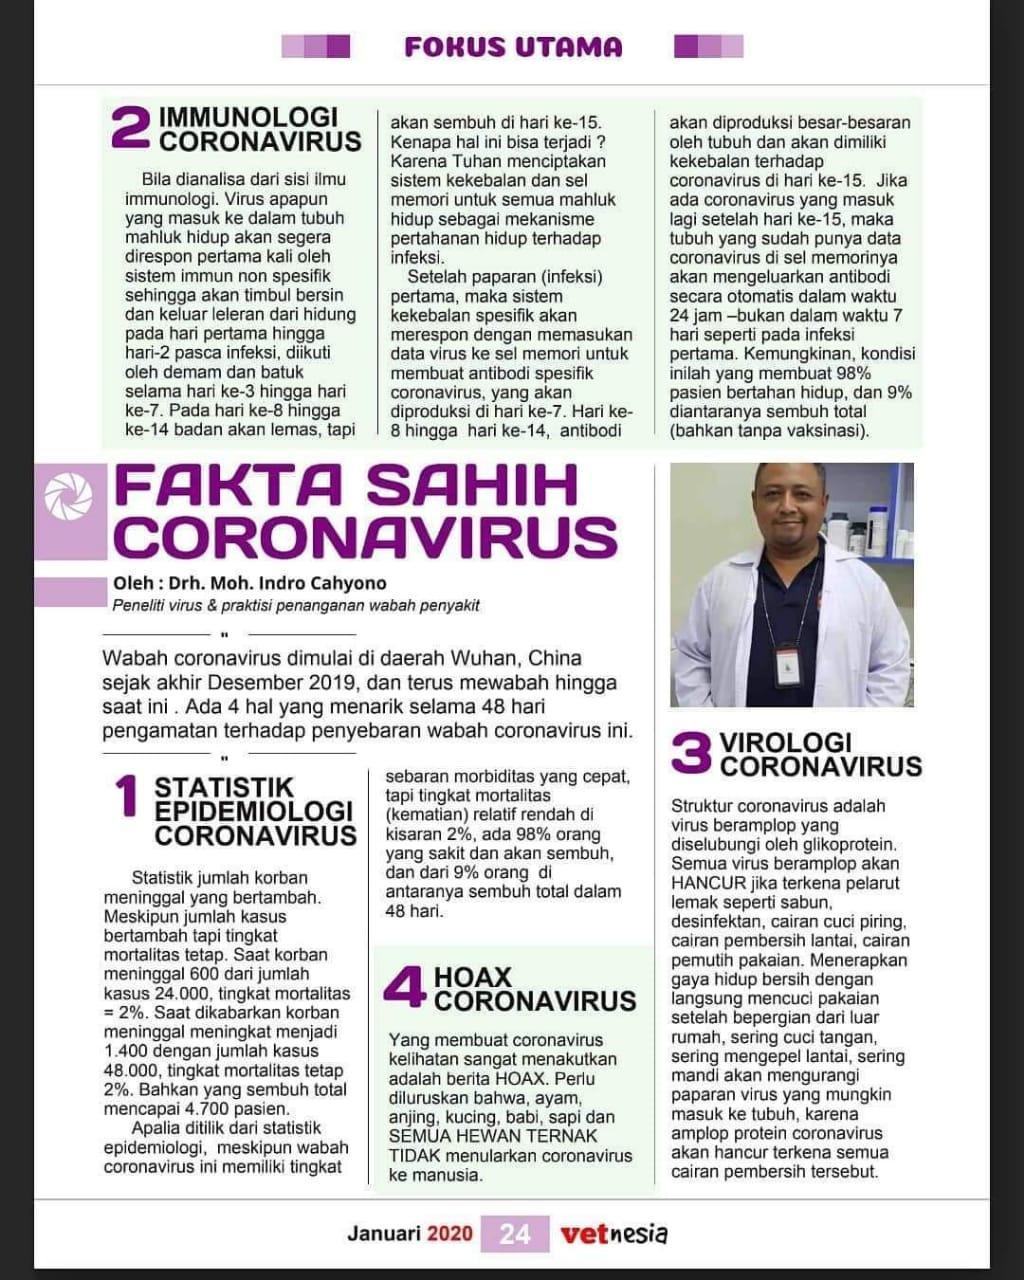 4 Fakta Tentang Virus Corona Menurut Drh. Moh. Indro Cahyono